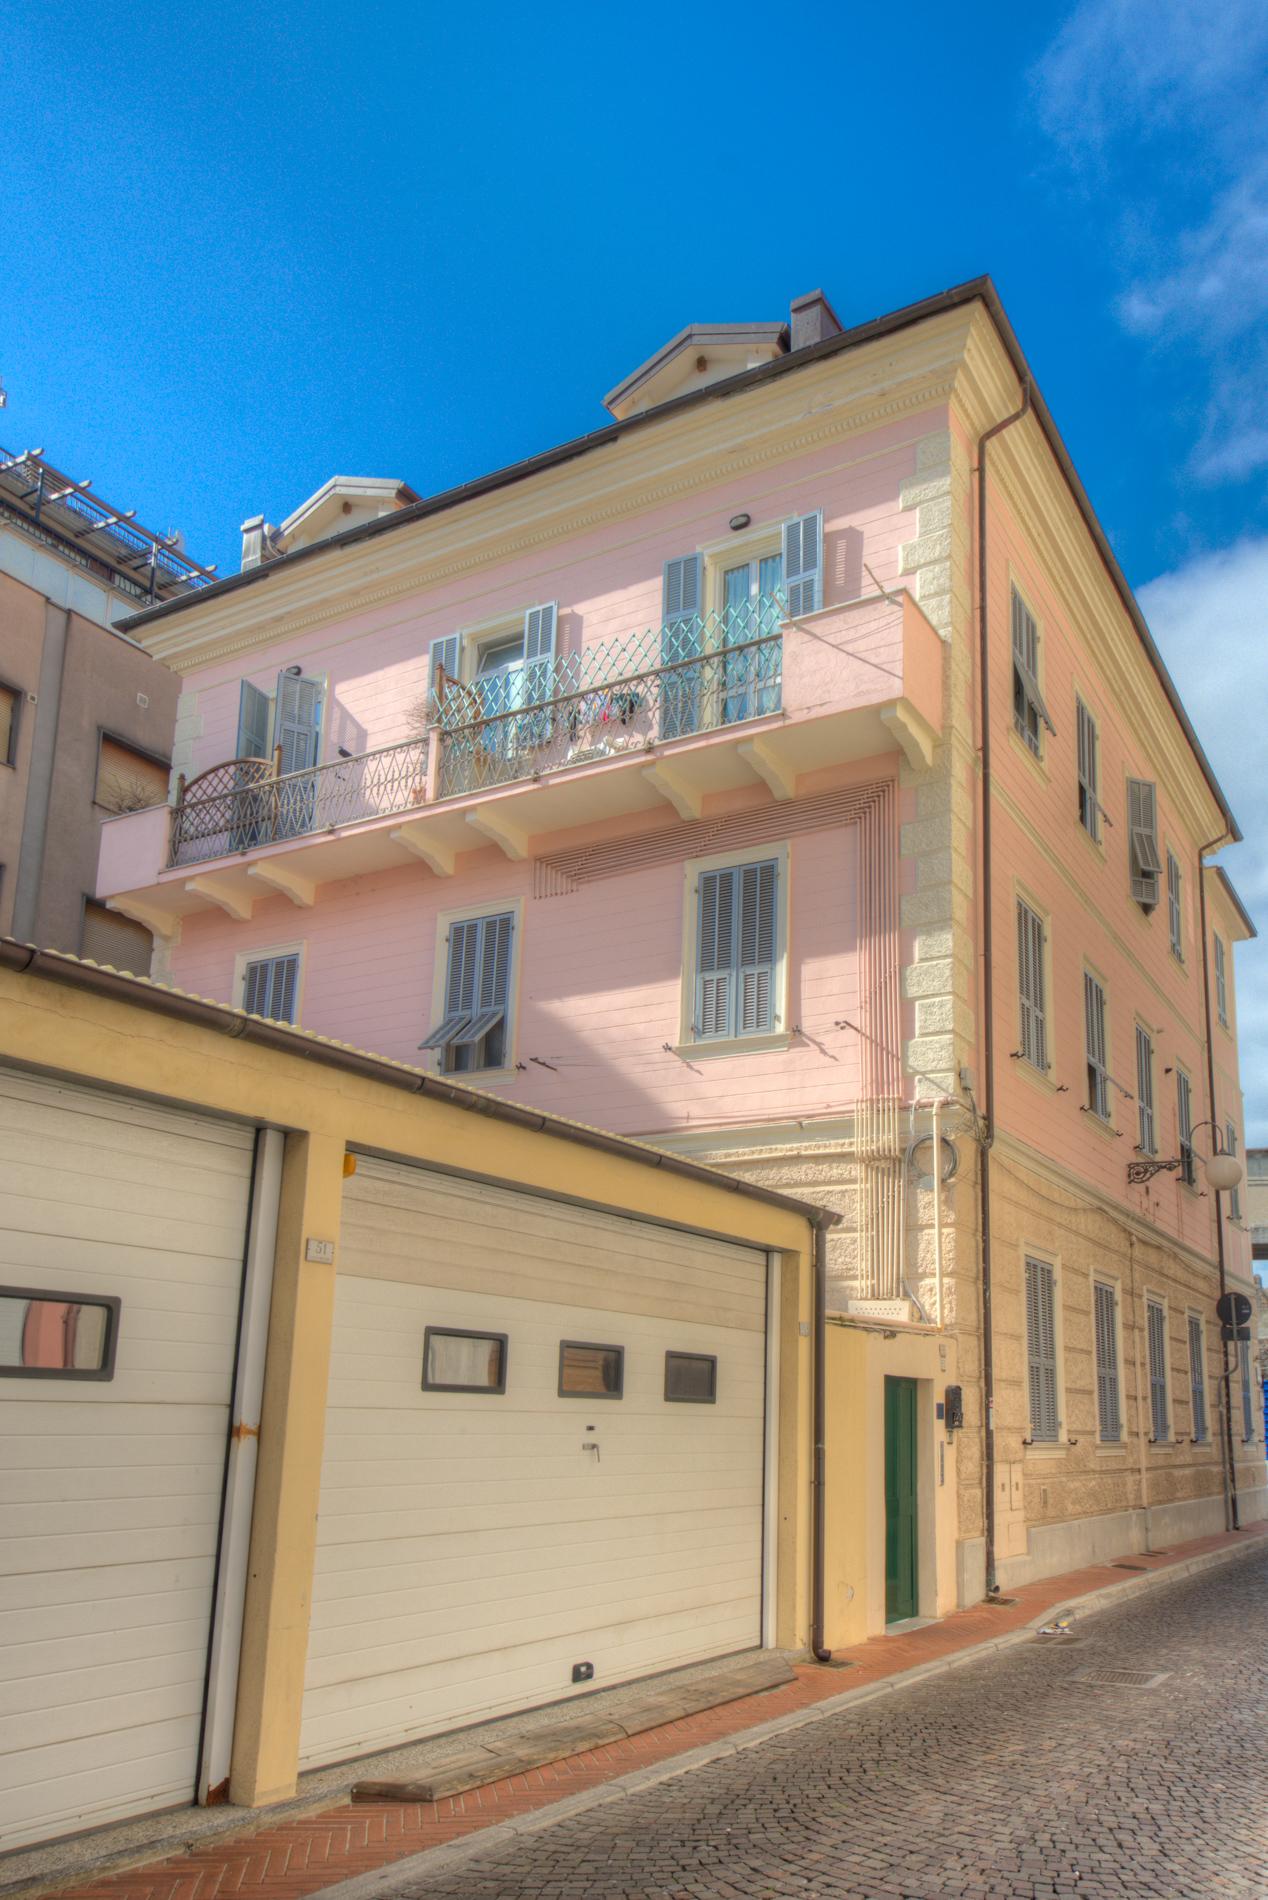 Bilocale Pietra Ligure Via Chiazzari 8